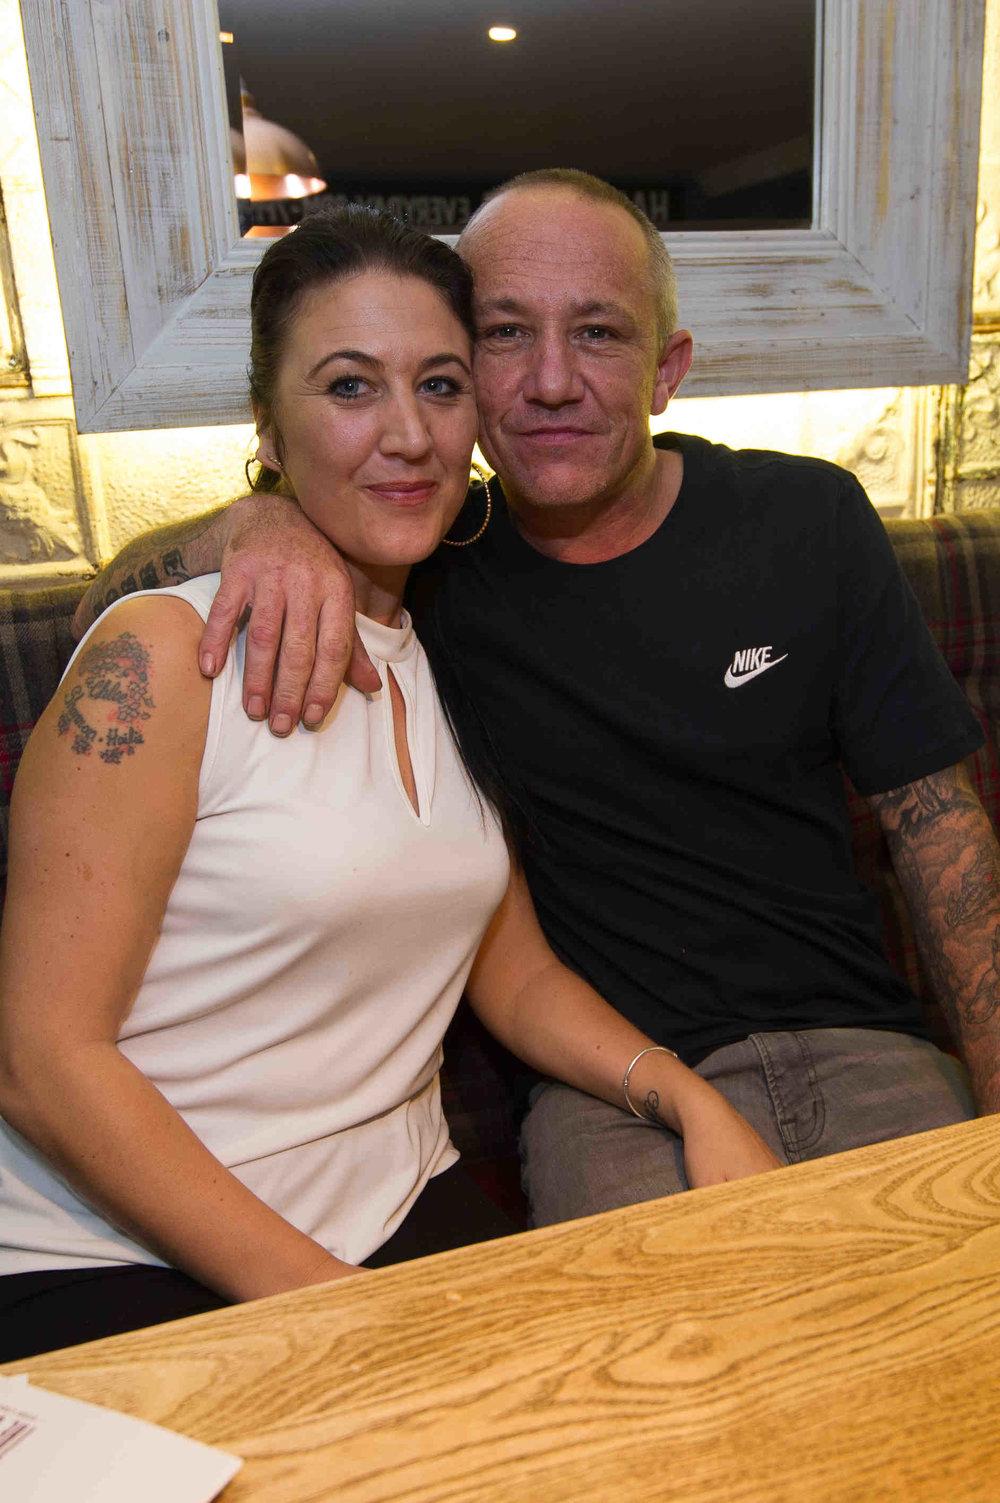 Snug Bar Bury St Edmunds Friday_MATTHEW POWER PHOTOGRAPHY058.JPG